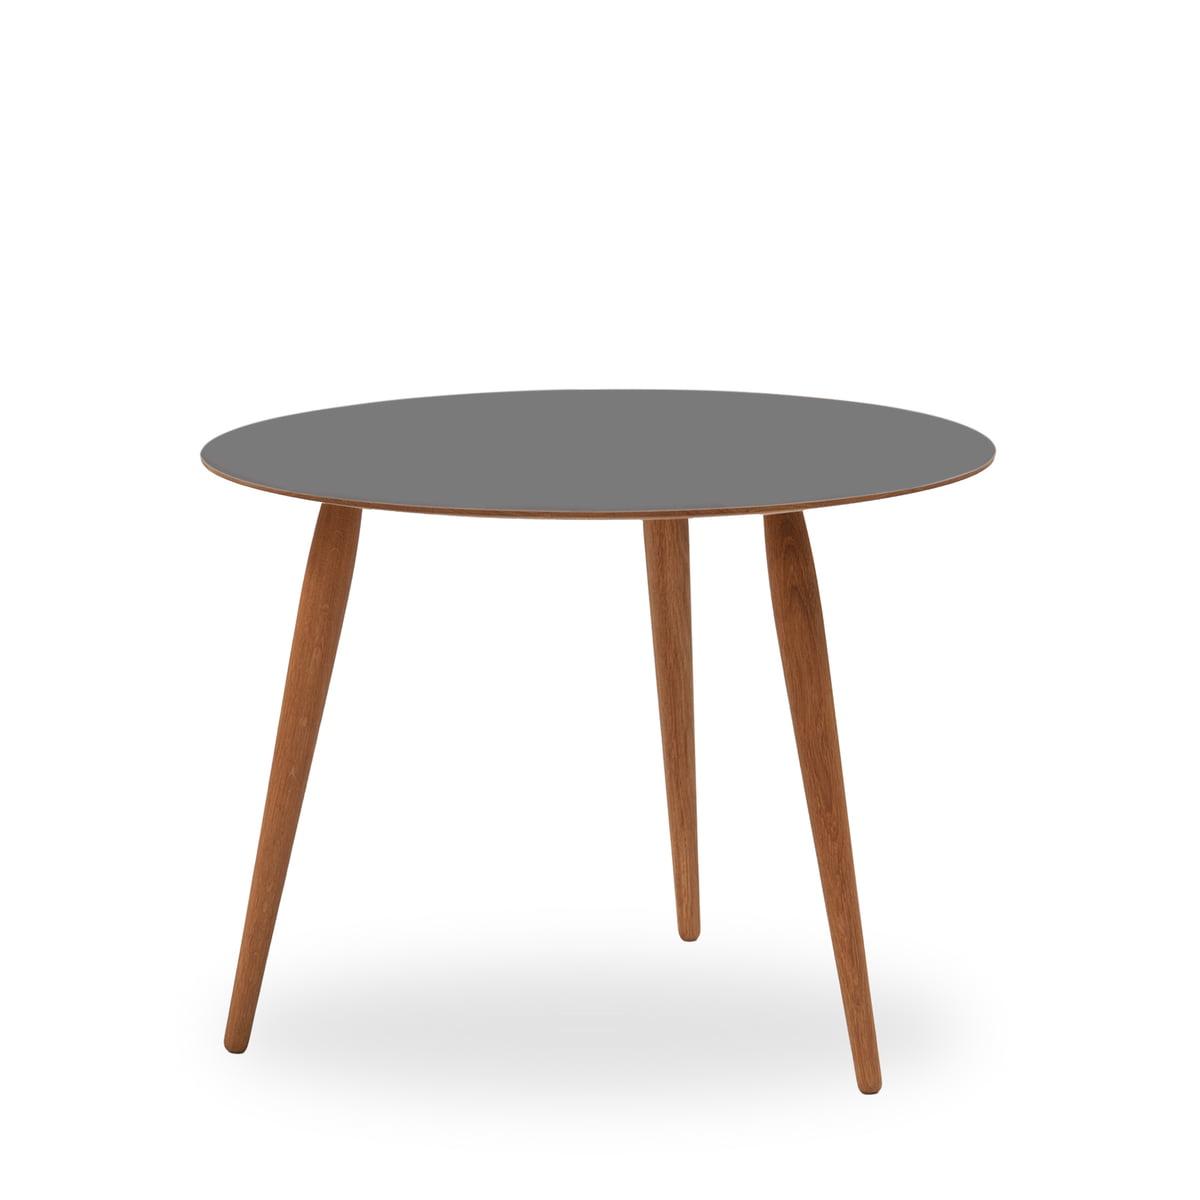 bruunmunch - Table d´appoint Playround, stratifié Ø 75 cm, Storm Grey/chêne huilé